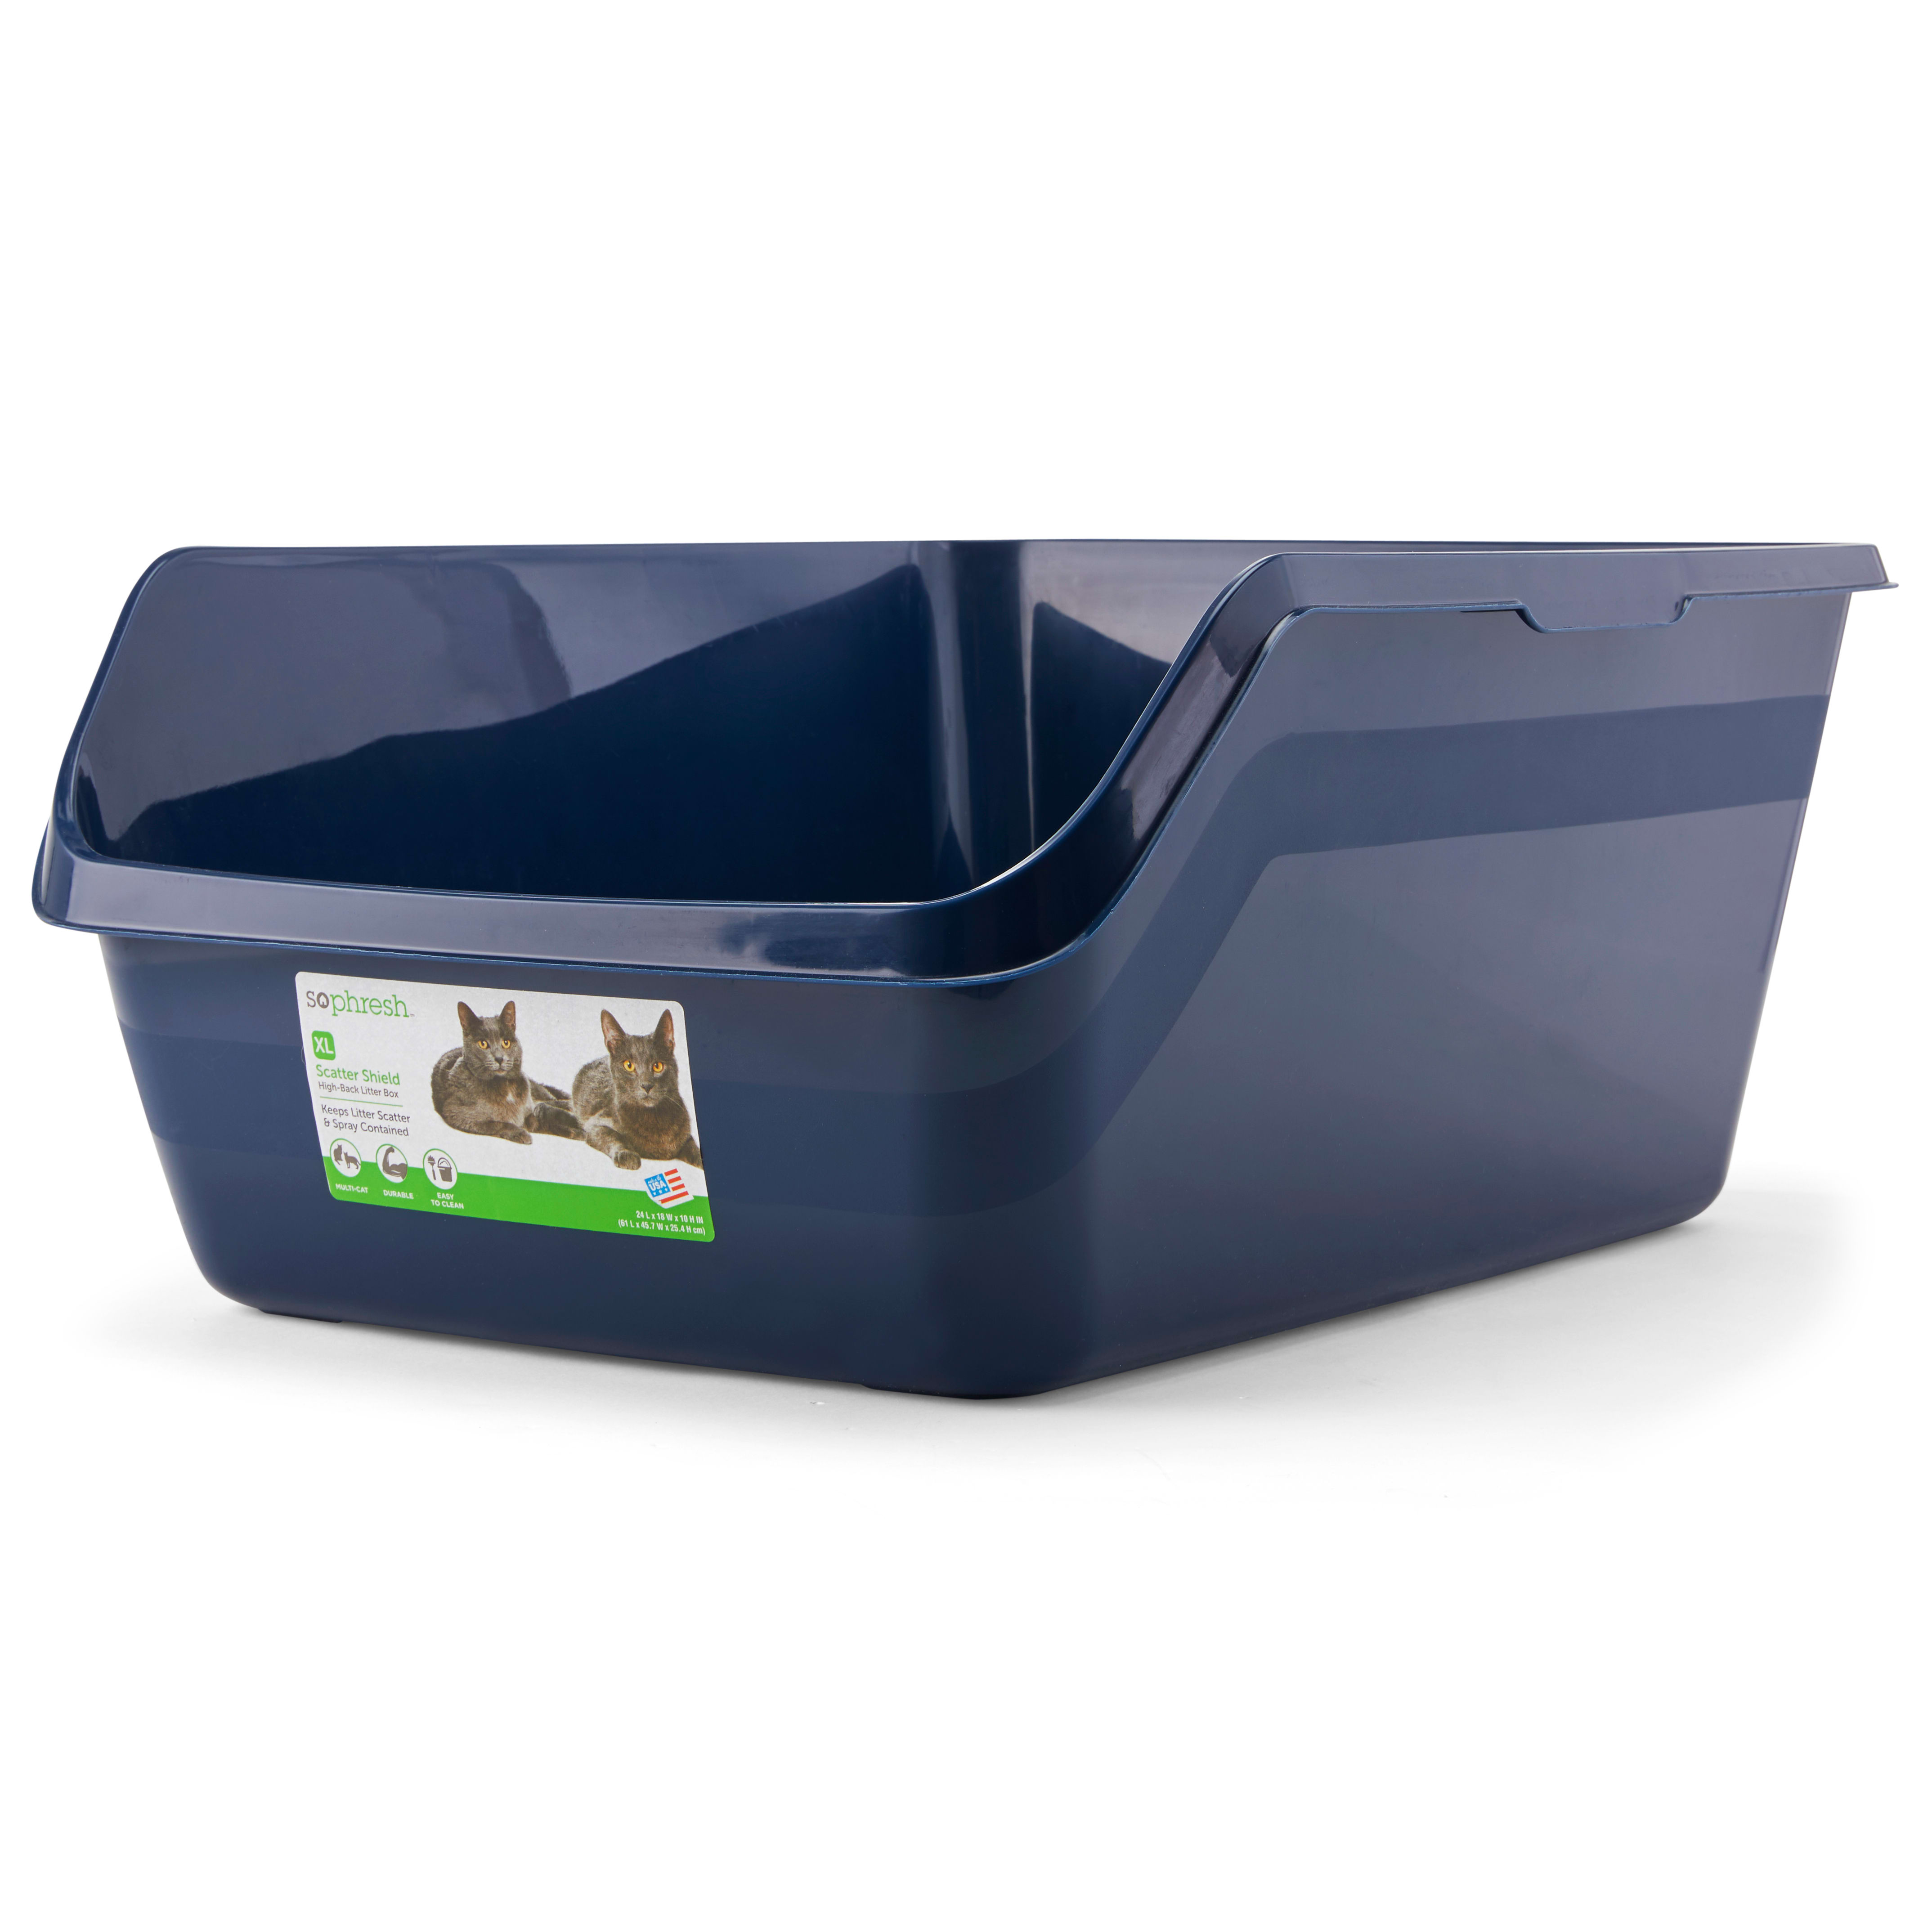 So Phresh Dog Litter Box